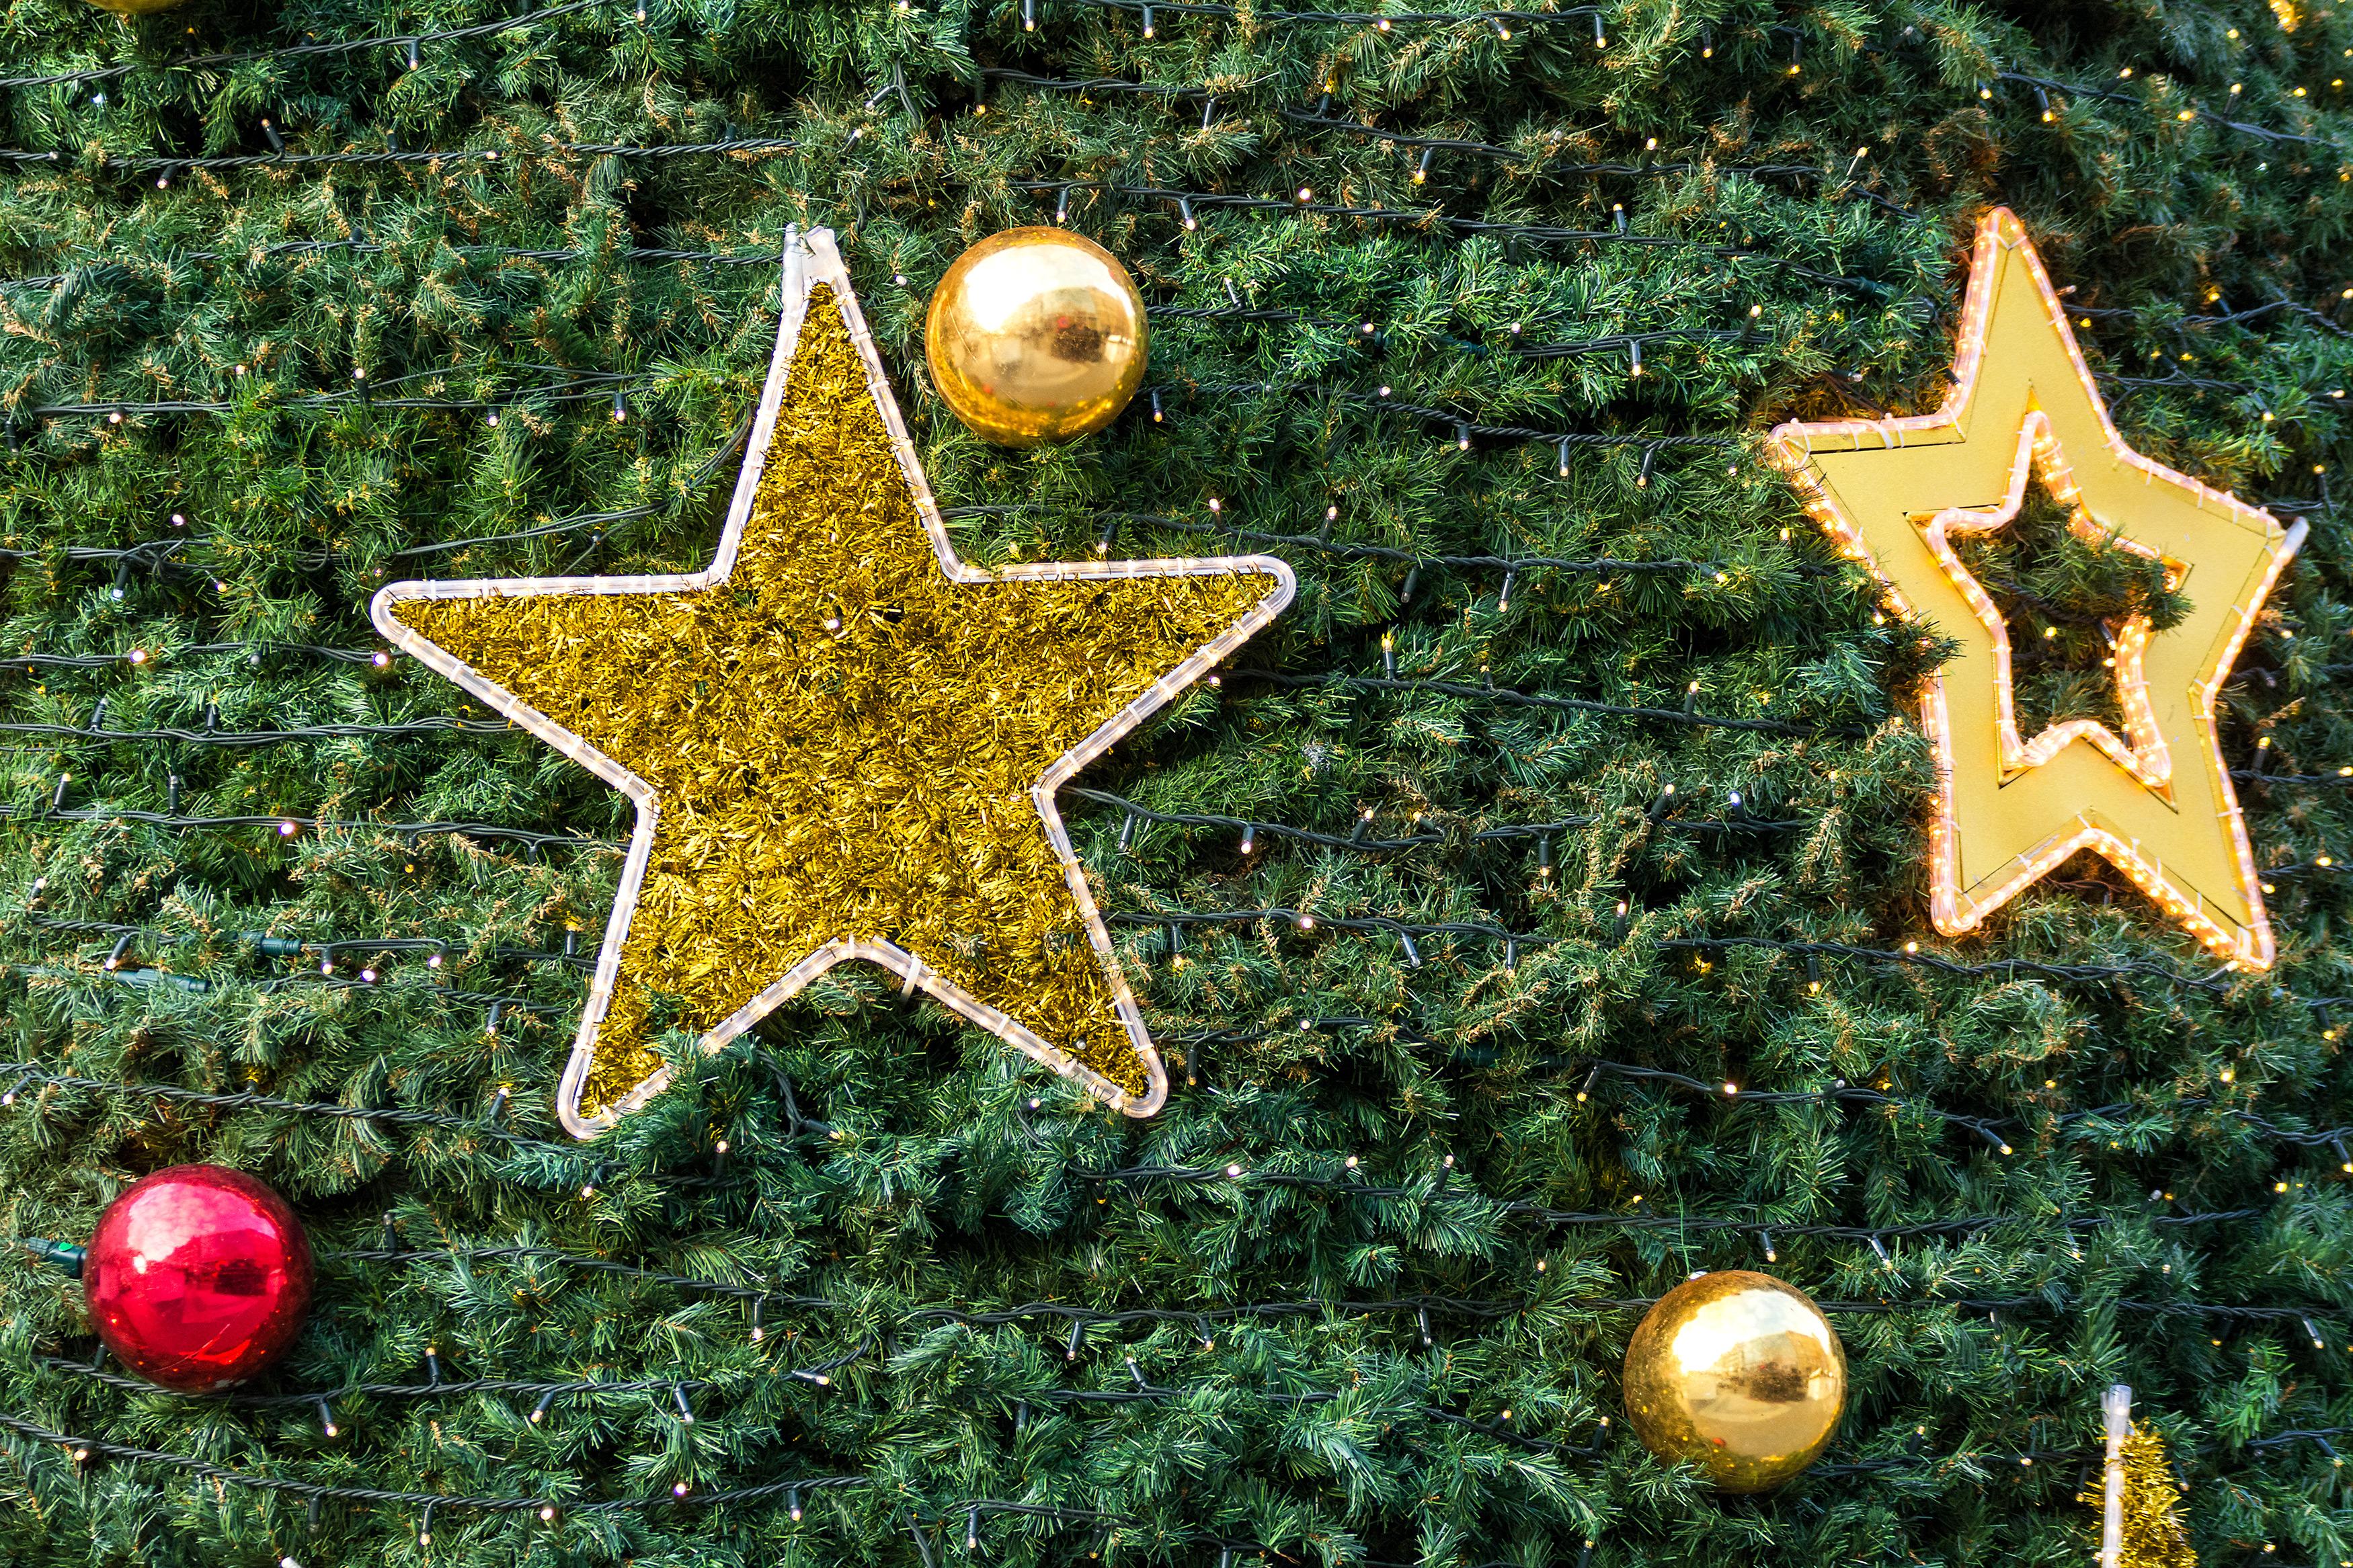 FREE IMAGE: Christmas Stars - Libreshot Public Domain Photos